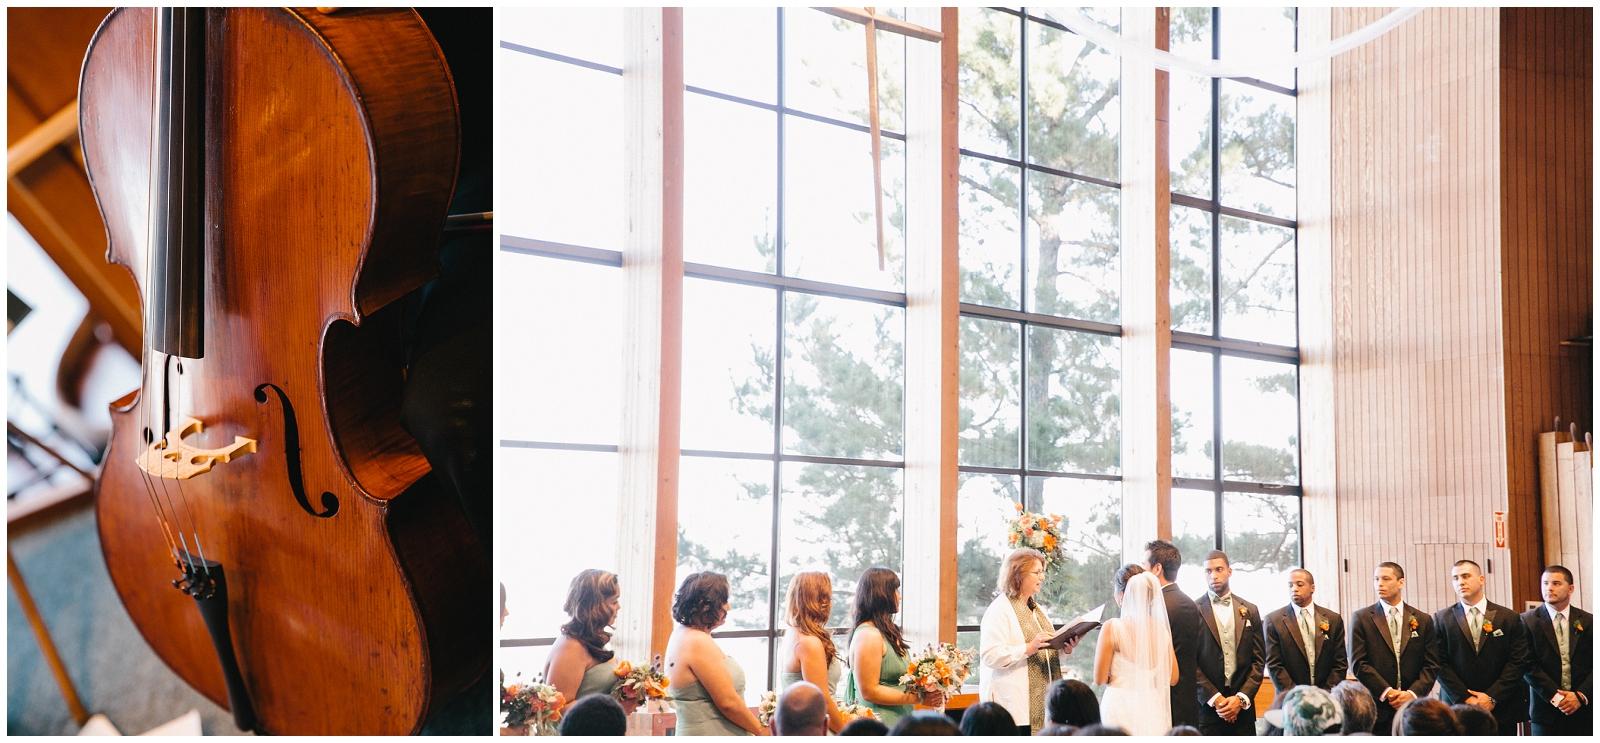 San-Francisco-Bay-Area-Wedding-Photography_Skyline_Church_8.jpg